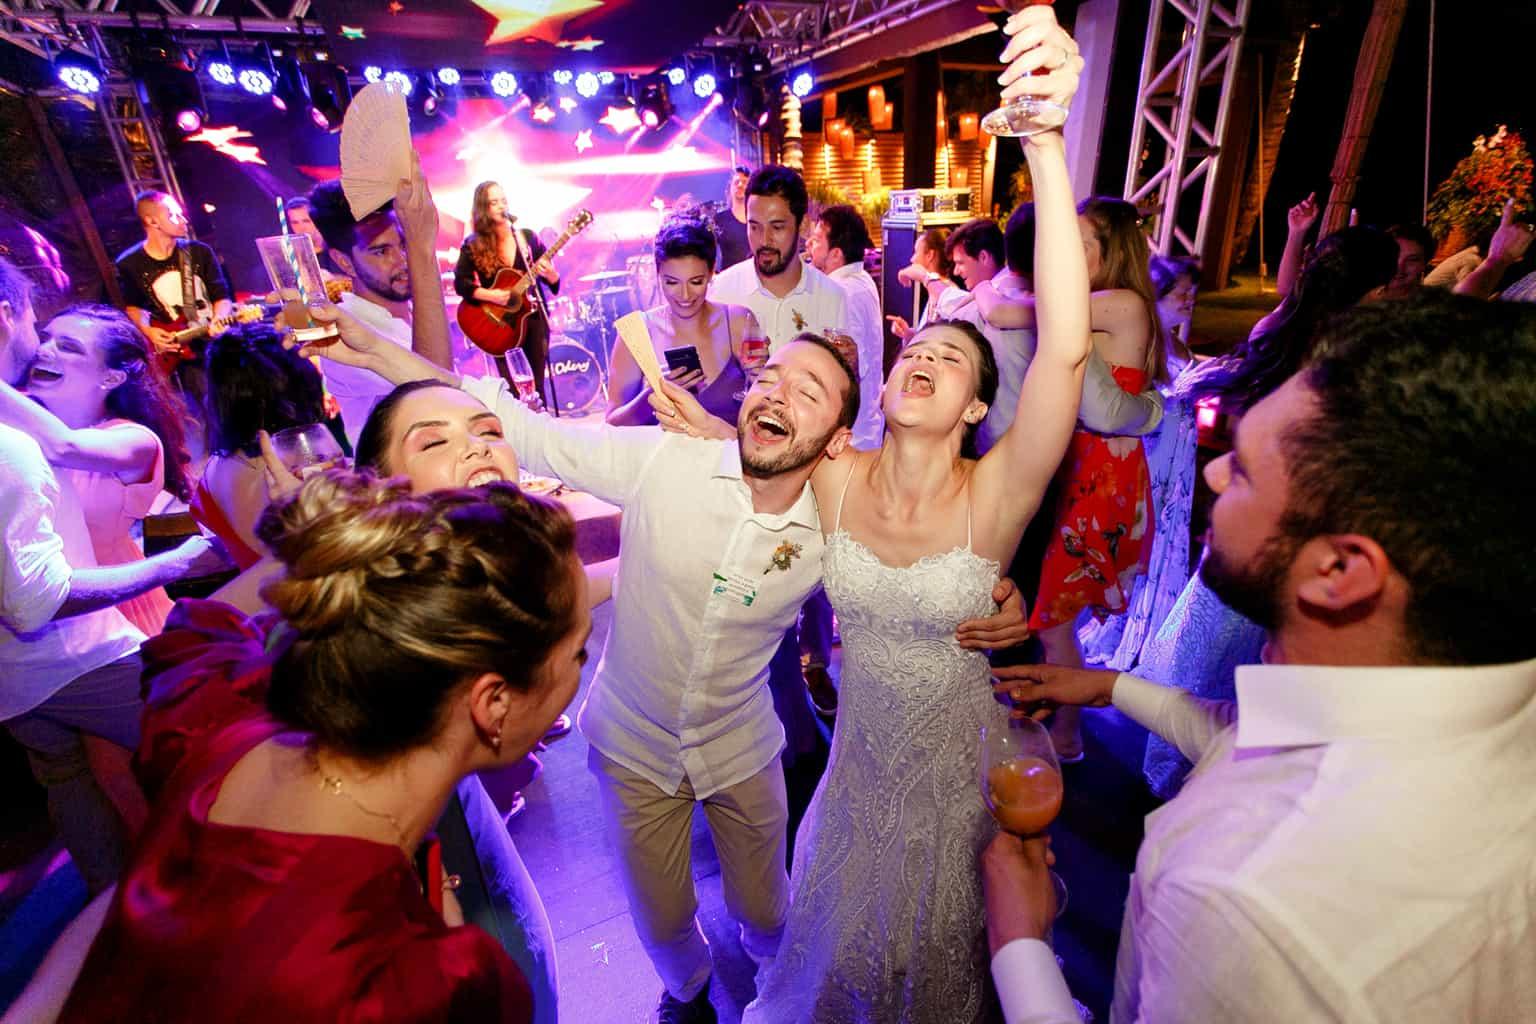 Casamento-Emanuelle-e-Alysson-Fotografia-Tadeu-Nanó-e-Luca-Antunes171